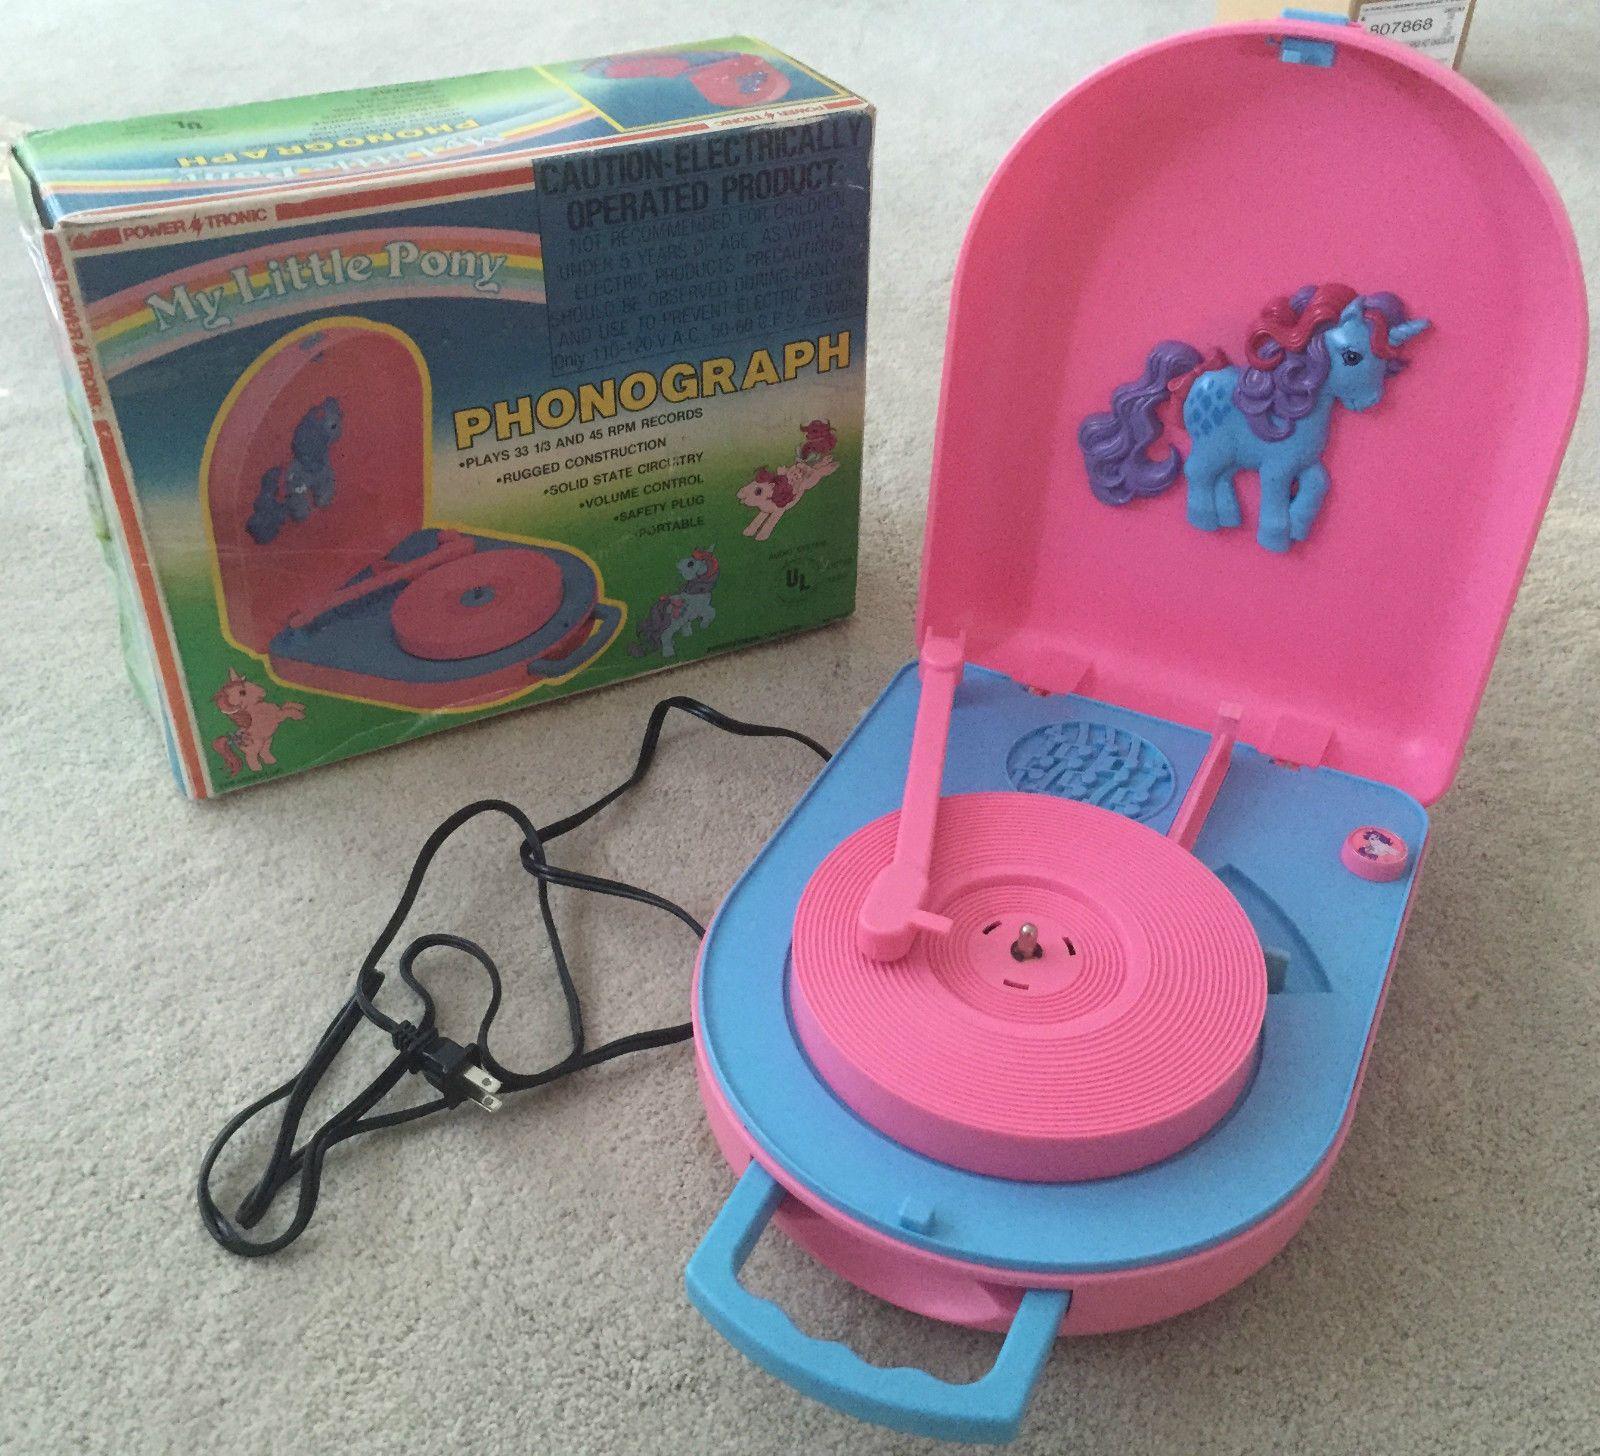 Rare Vintage 1984 Original My Little Pony Vinyl Record Player Phonograph Box Ebay Original My Little Pony Vintage My Little Pony My Little Pony Merchandise